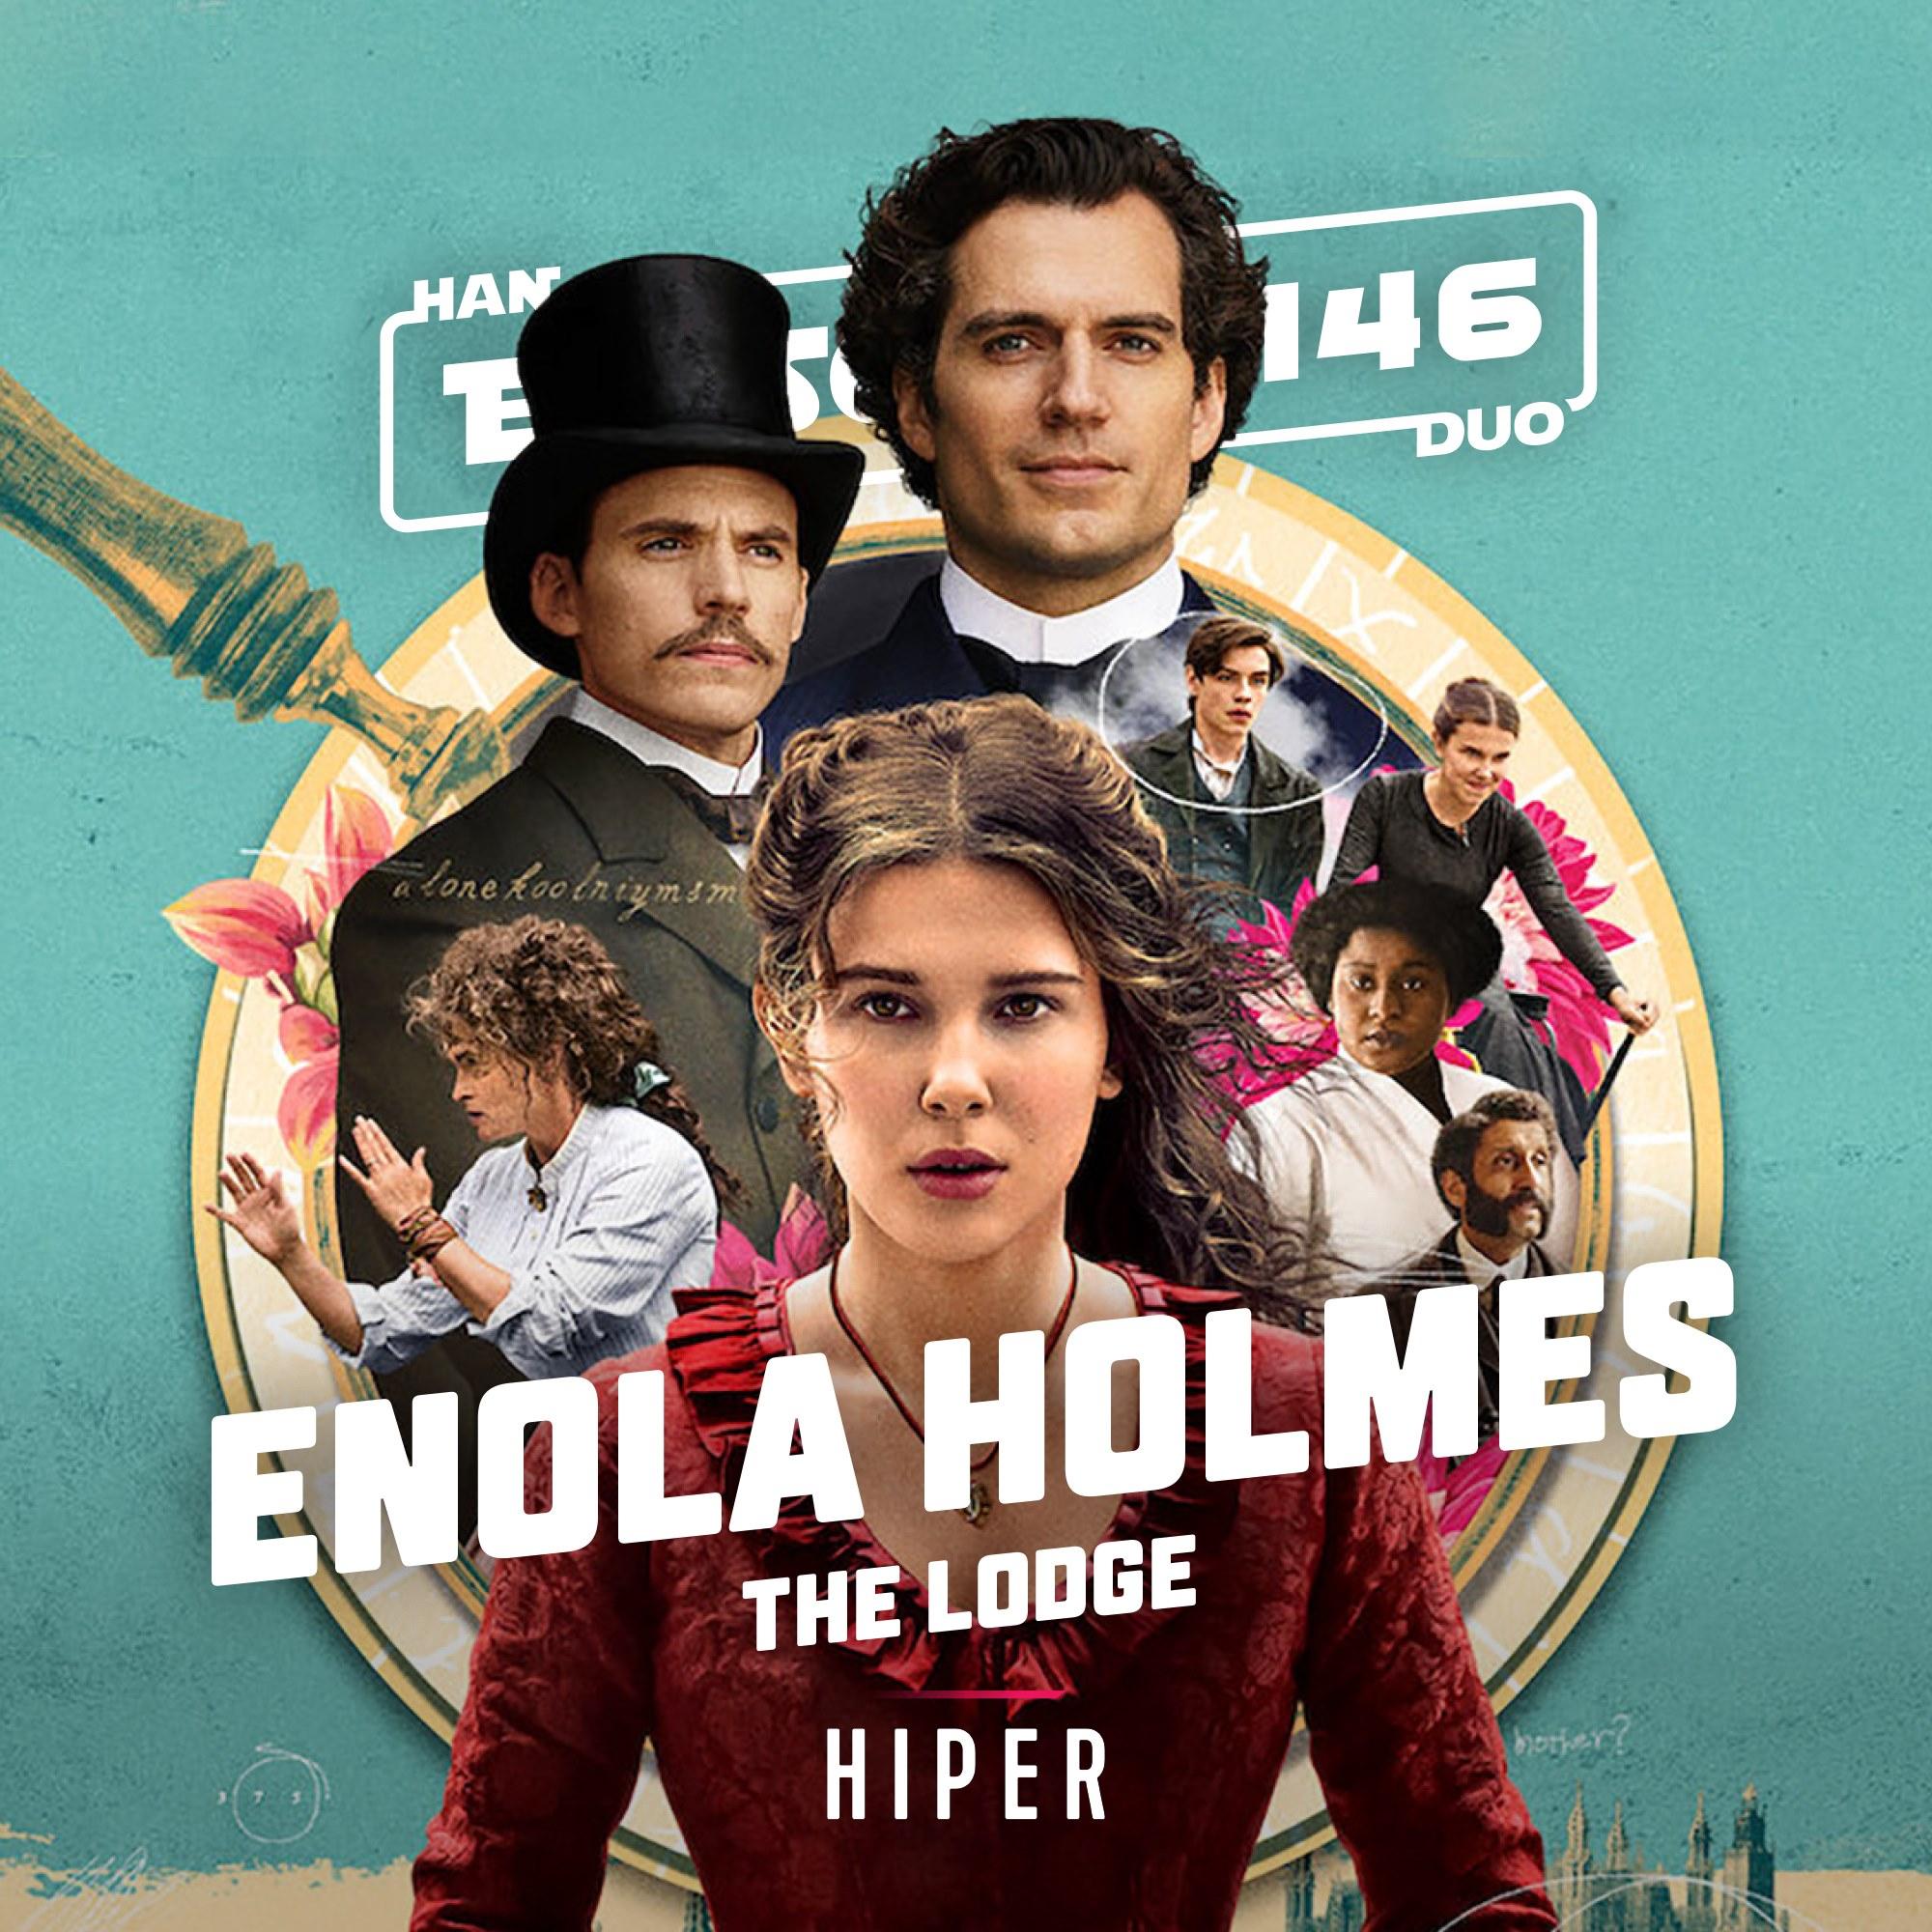 Han Duo #146: Enola Holmes, The Lodge